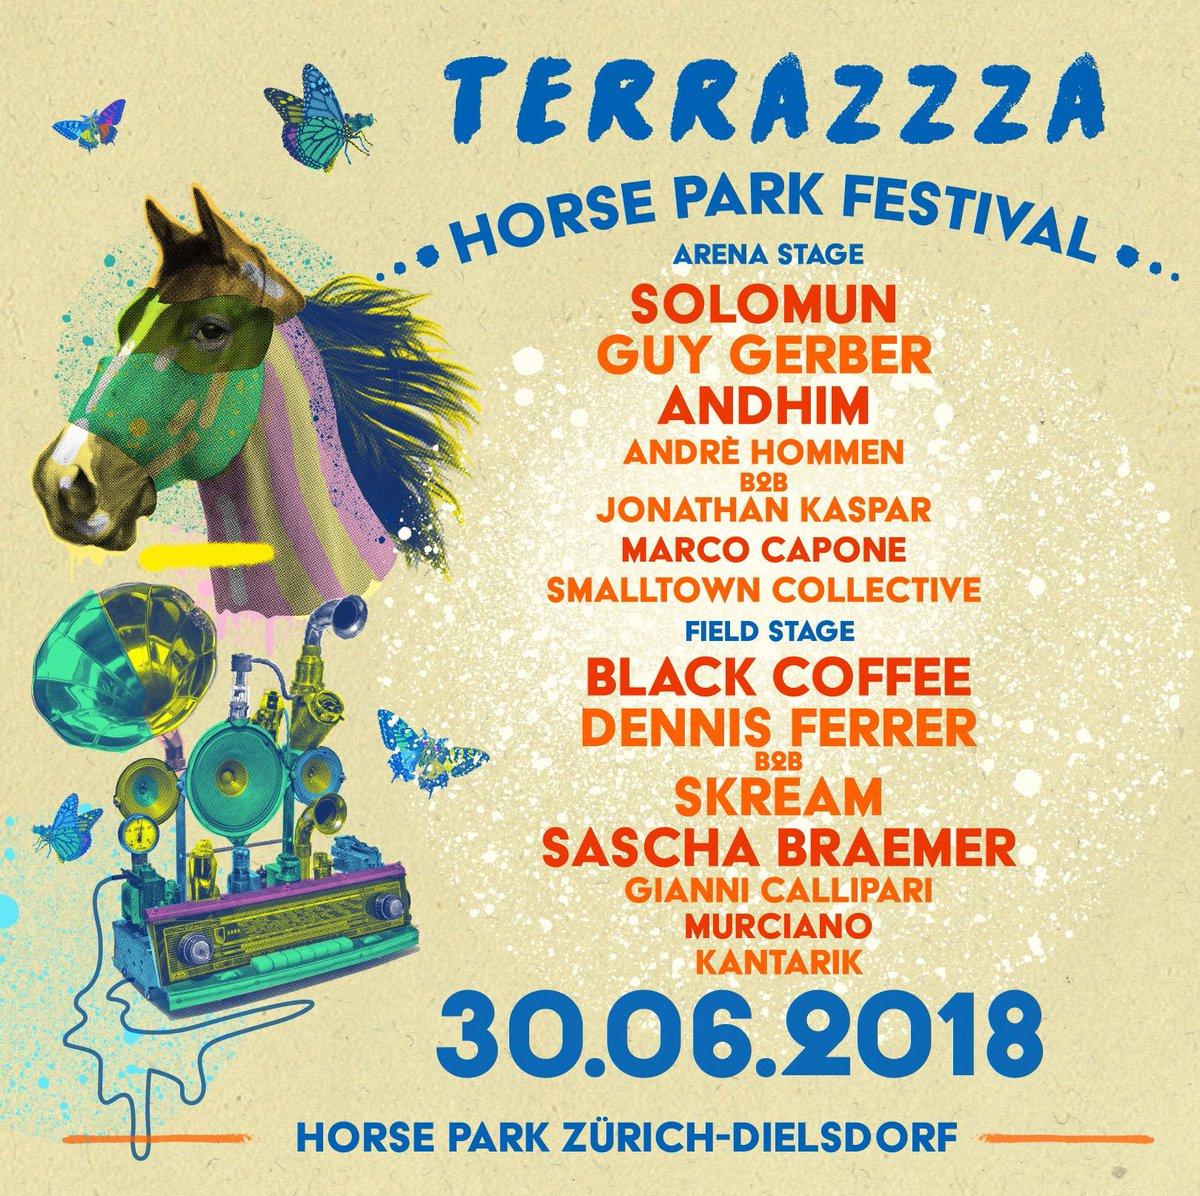 Terrazzza Hashtag On Twitter